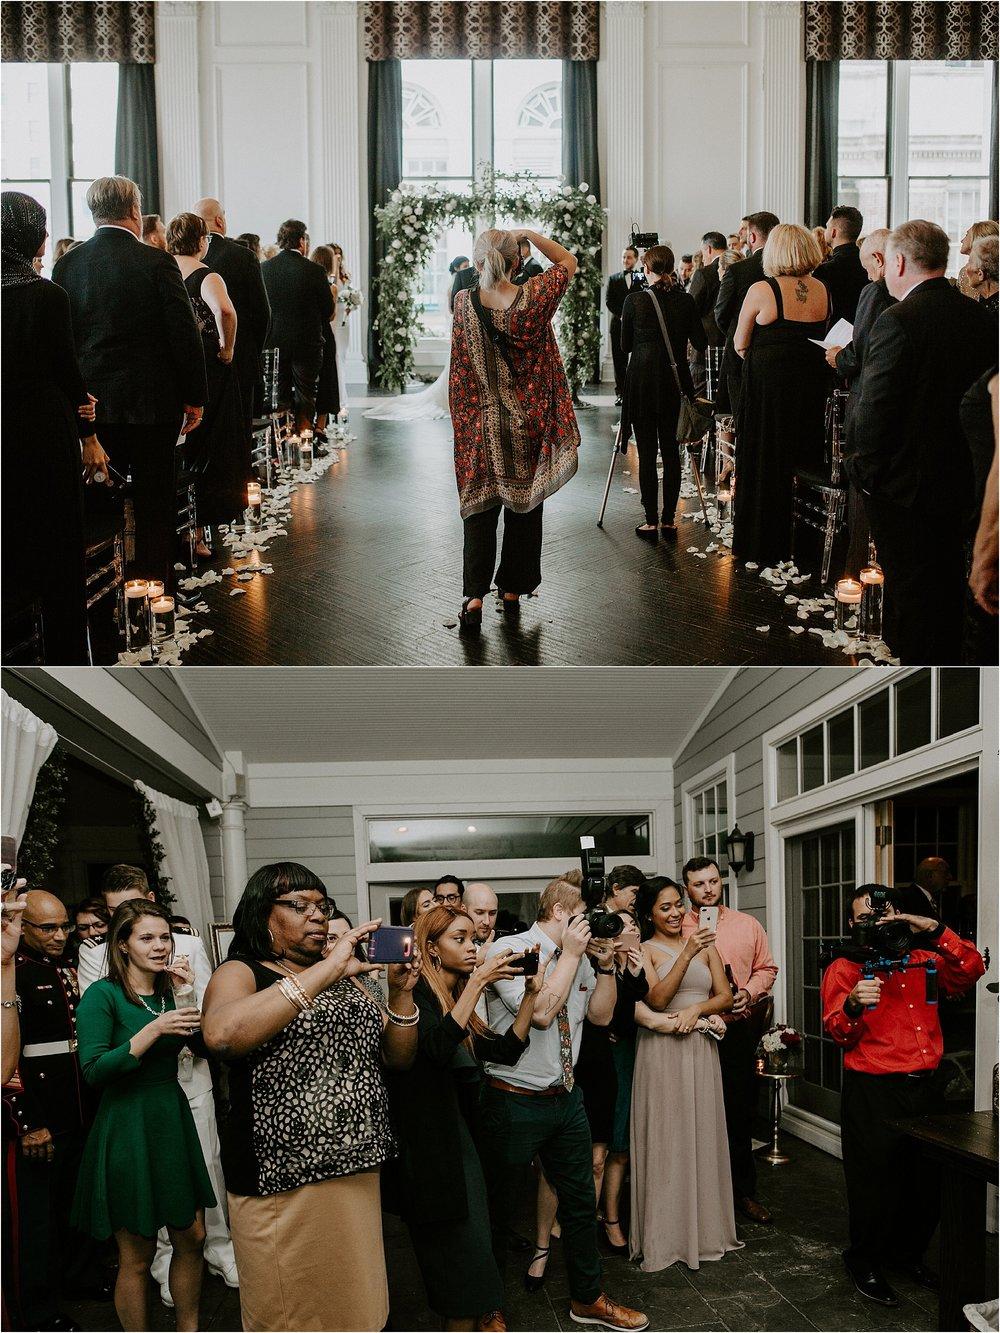 Sarah_Brookhart_PA_MD_Wedding_Photographer_0025.jpg